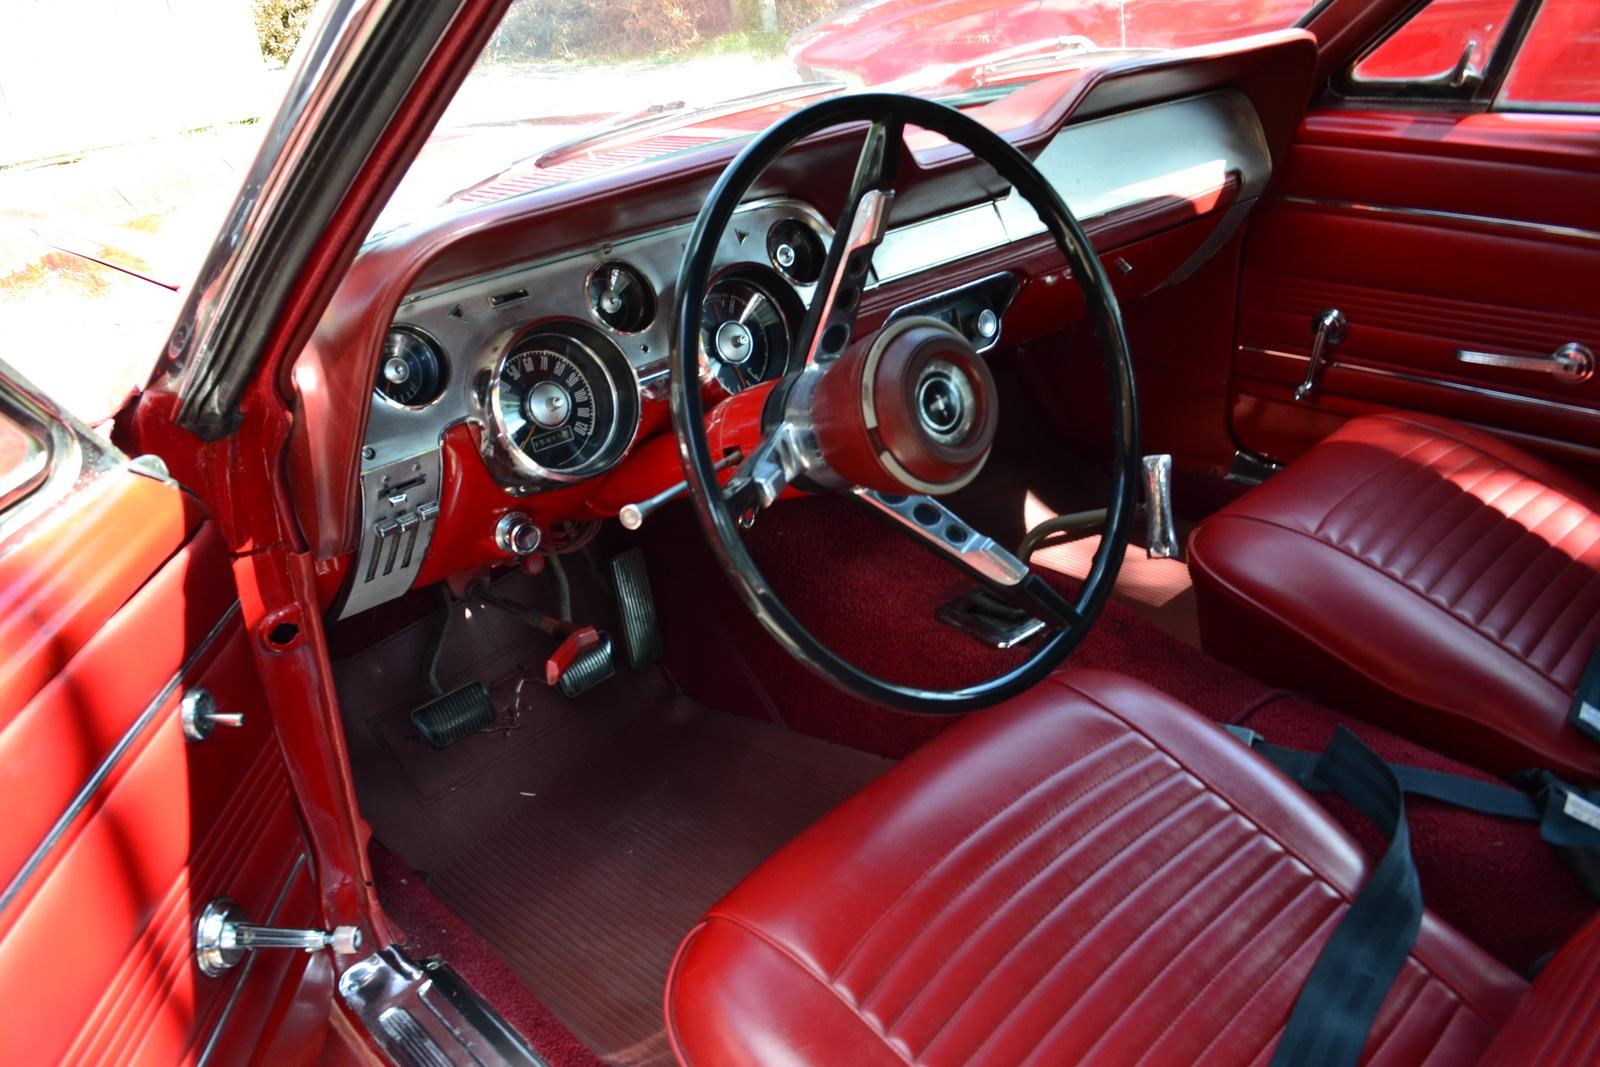 filename 1967_ford_mustang_convertible pic 5981639453829446854jpeg